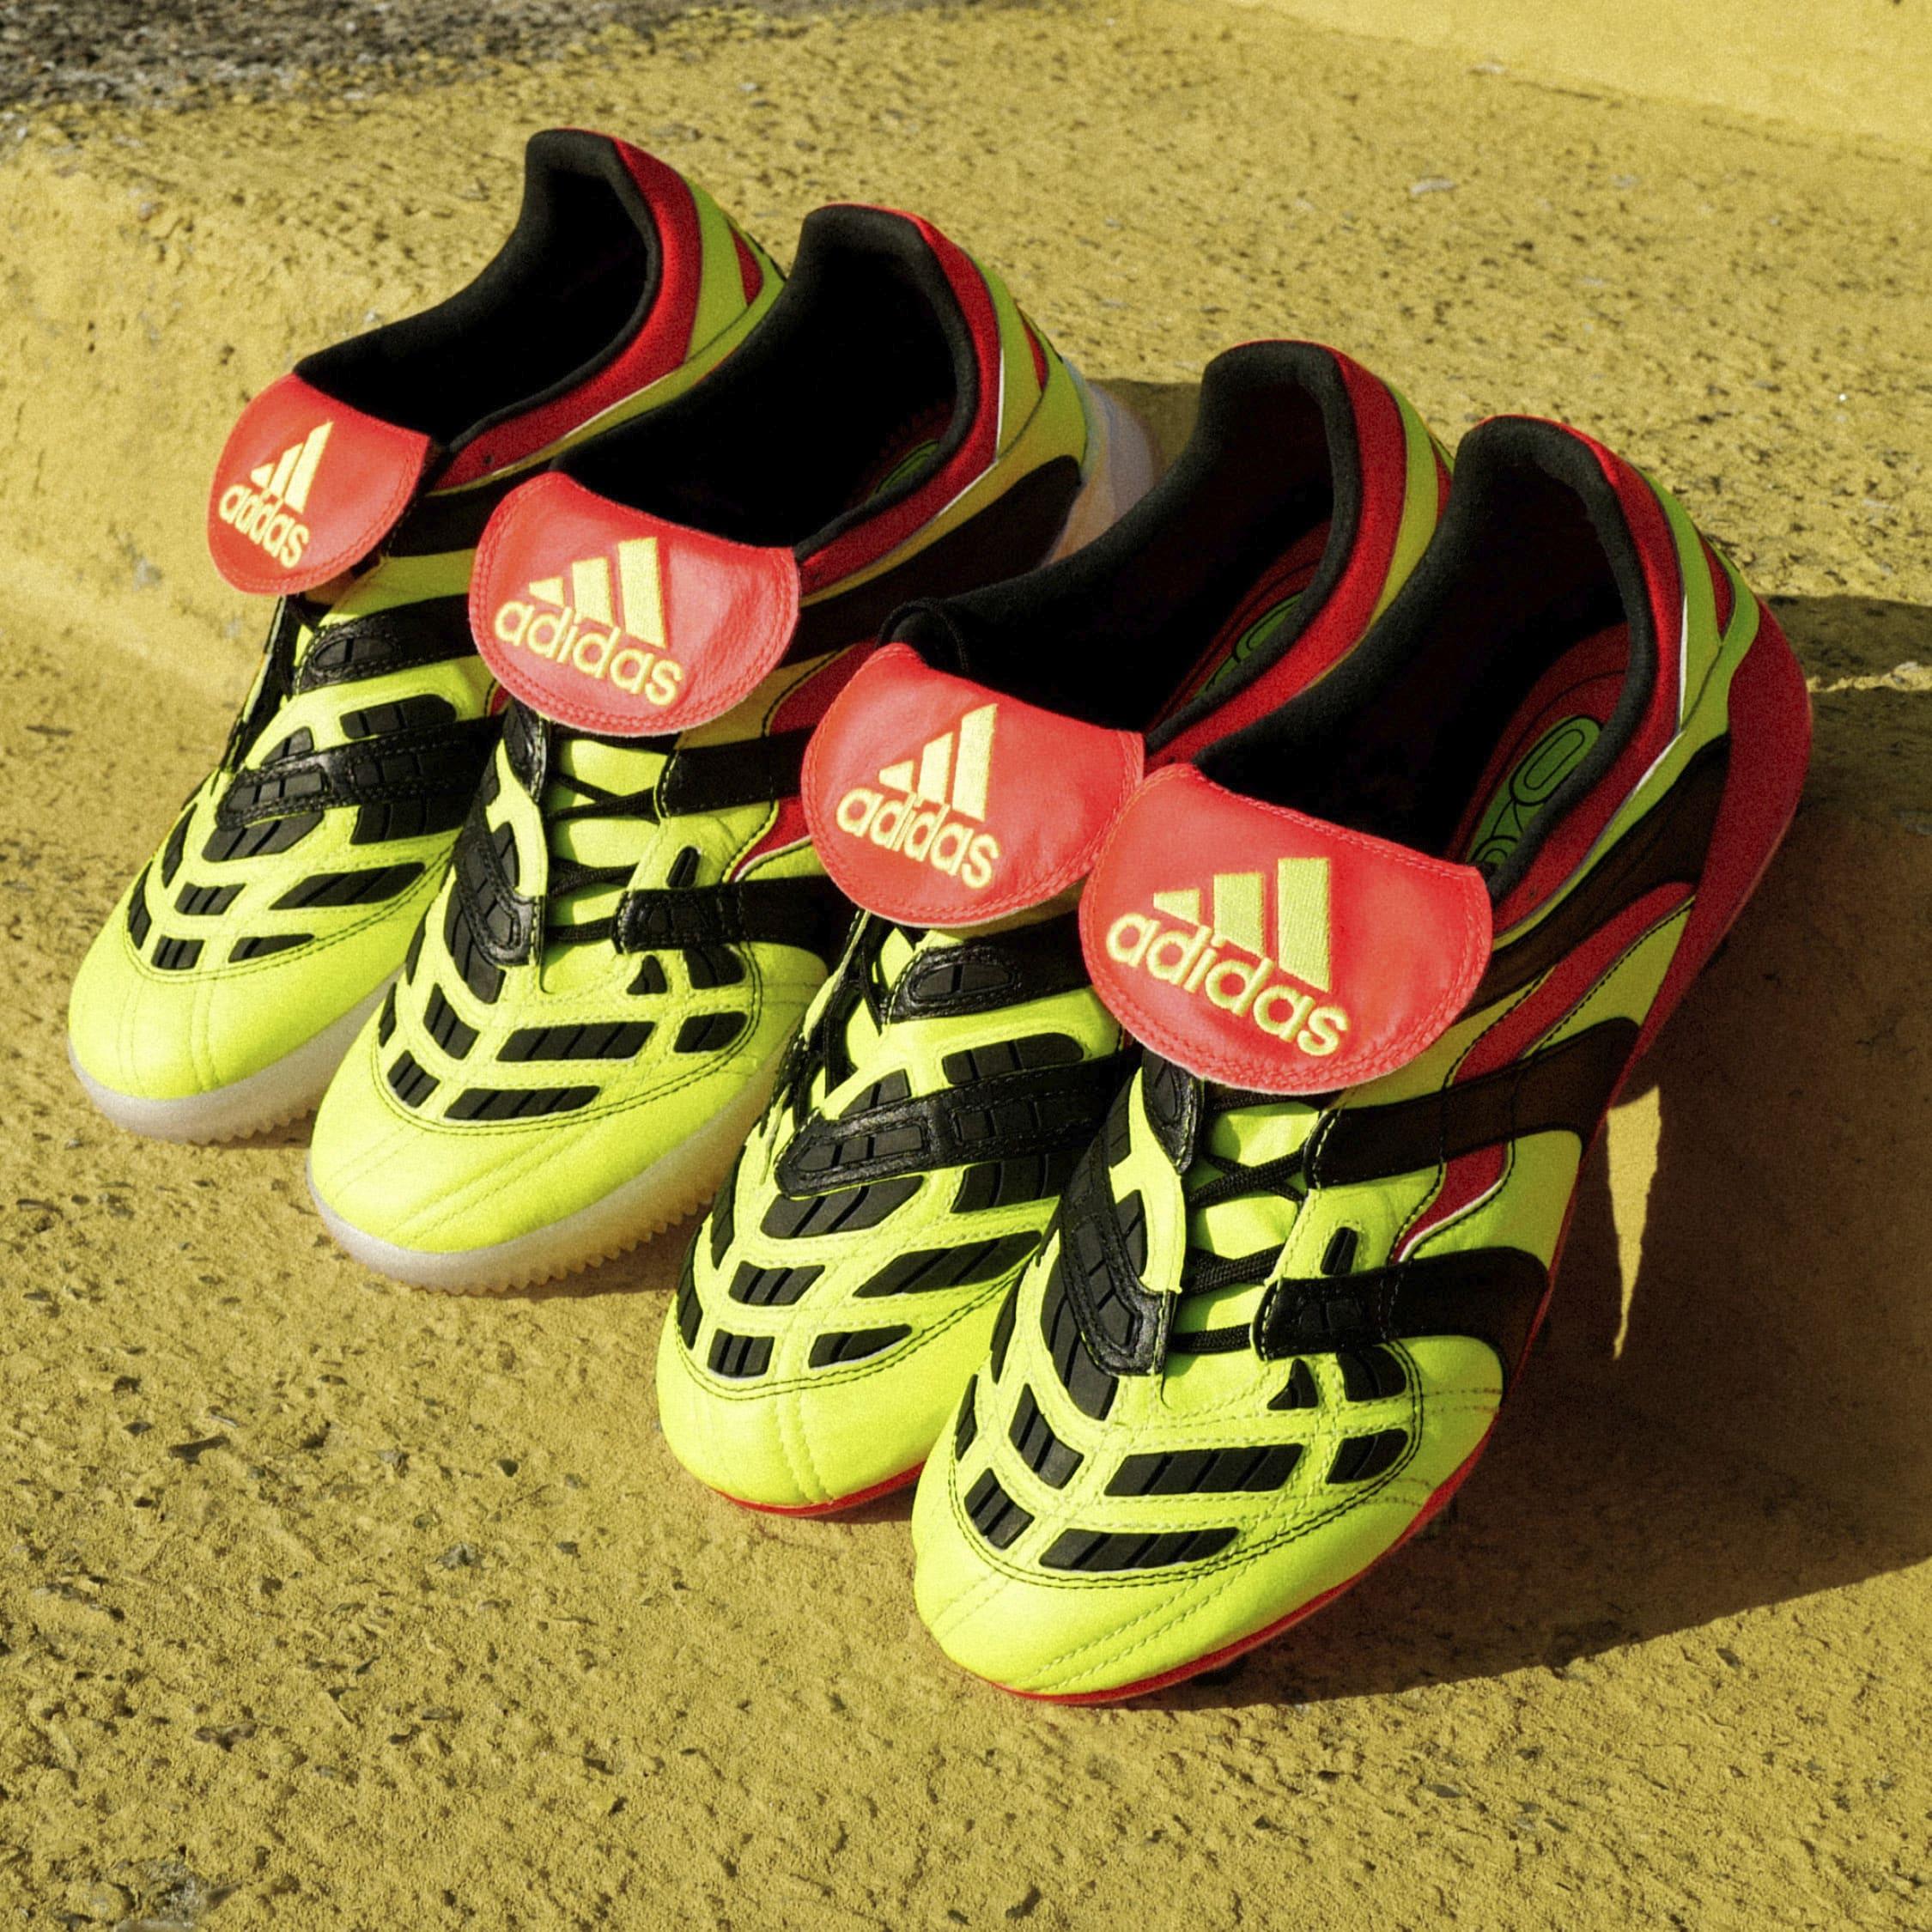 Chaussures-football-adidas-predator-accelerator-electricity-2018-juillet-2018-5